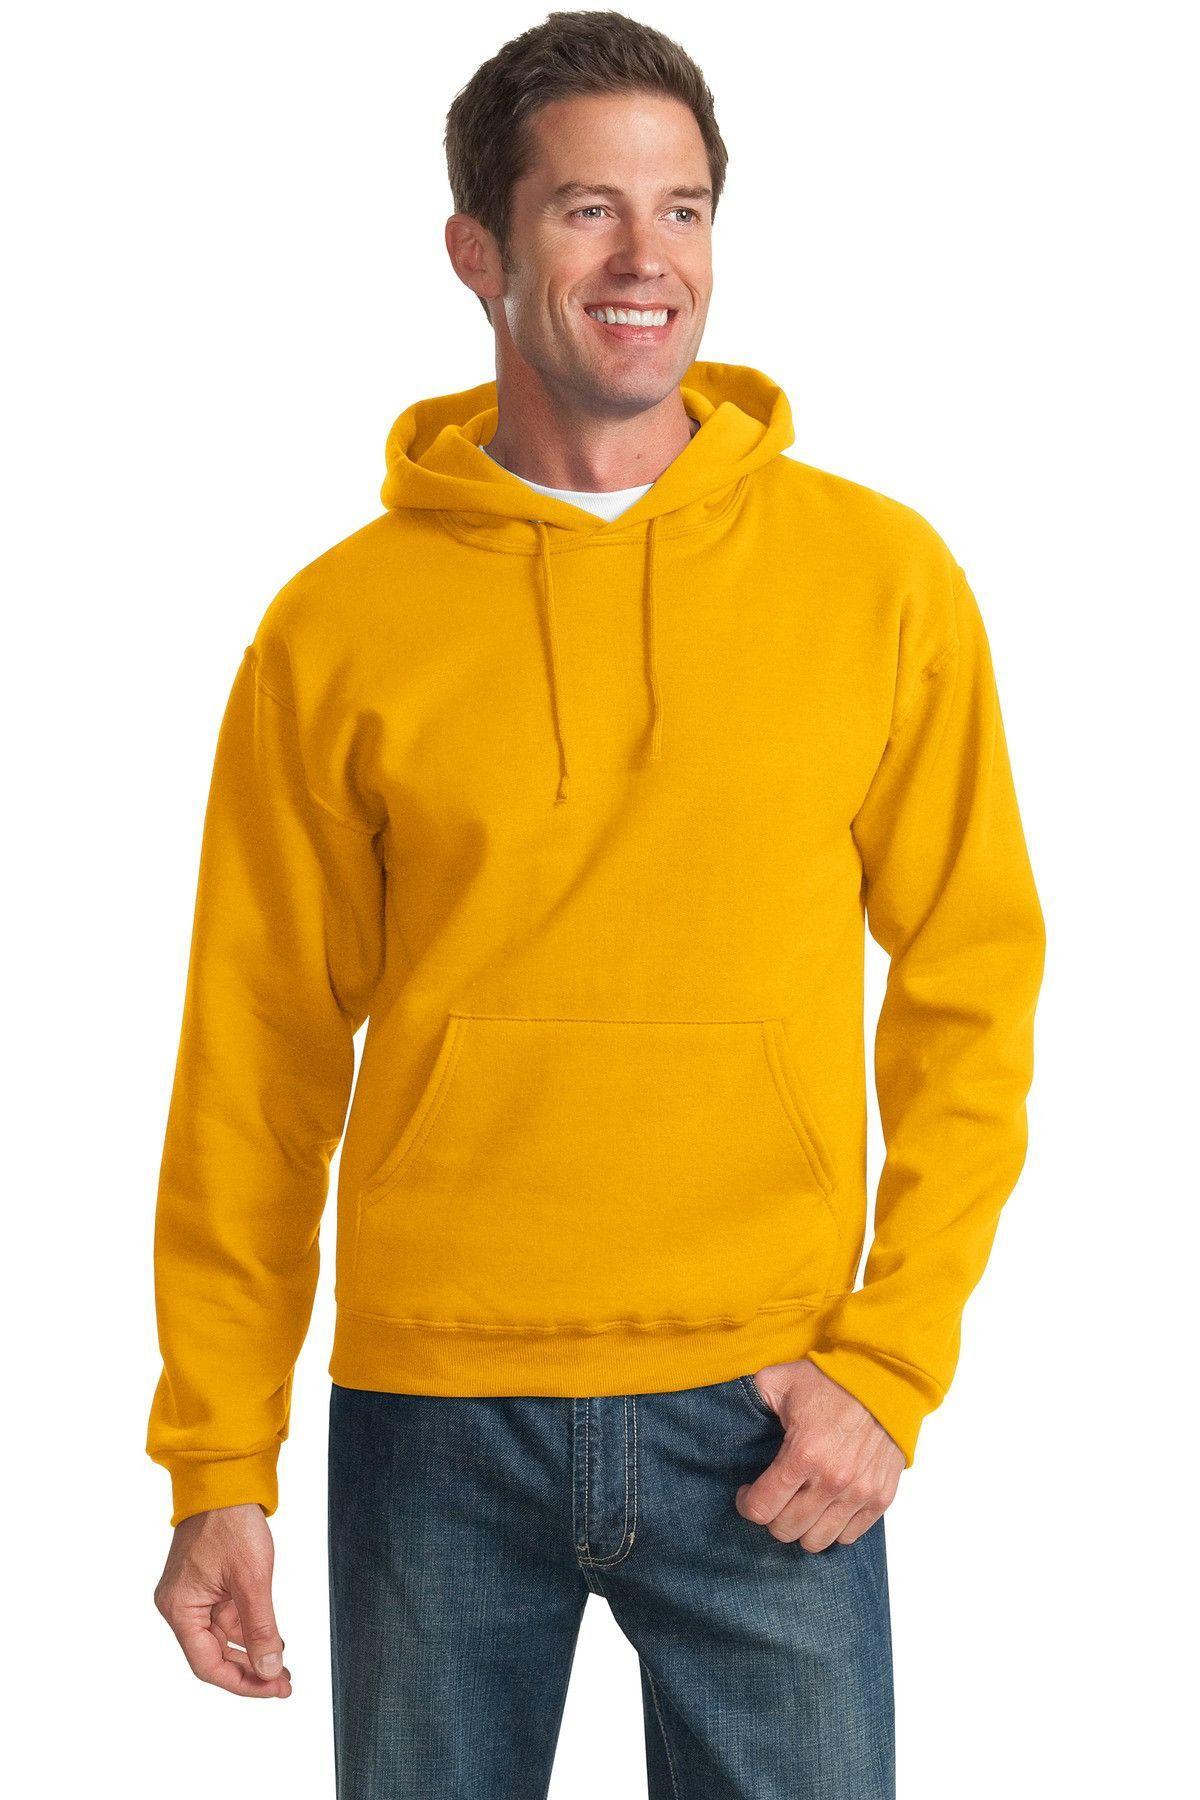 b45e63942bd JERZEES - NuBlend Pullover Hooded Sweatshirt.996M Gold